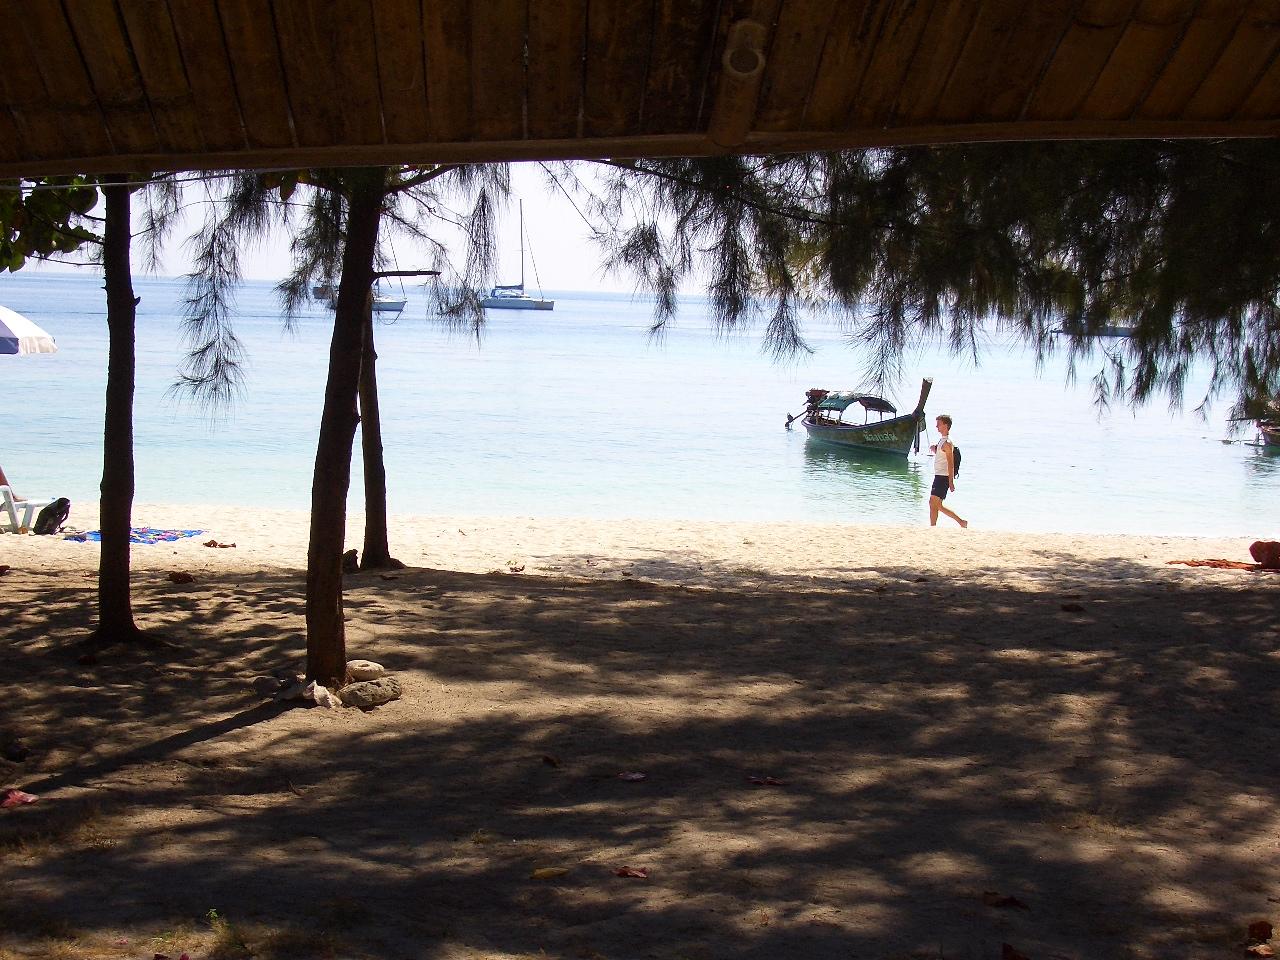 Bamboo garden rooms at lipe beach resort koh lipe - Green View Resort Koh Lipe Beach Front Bungalow Hot Water Shower